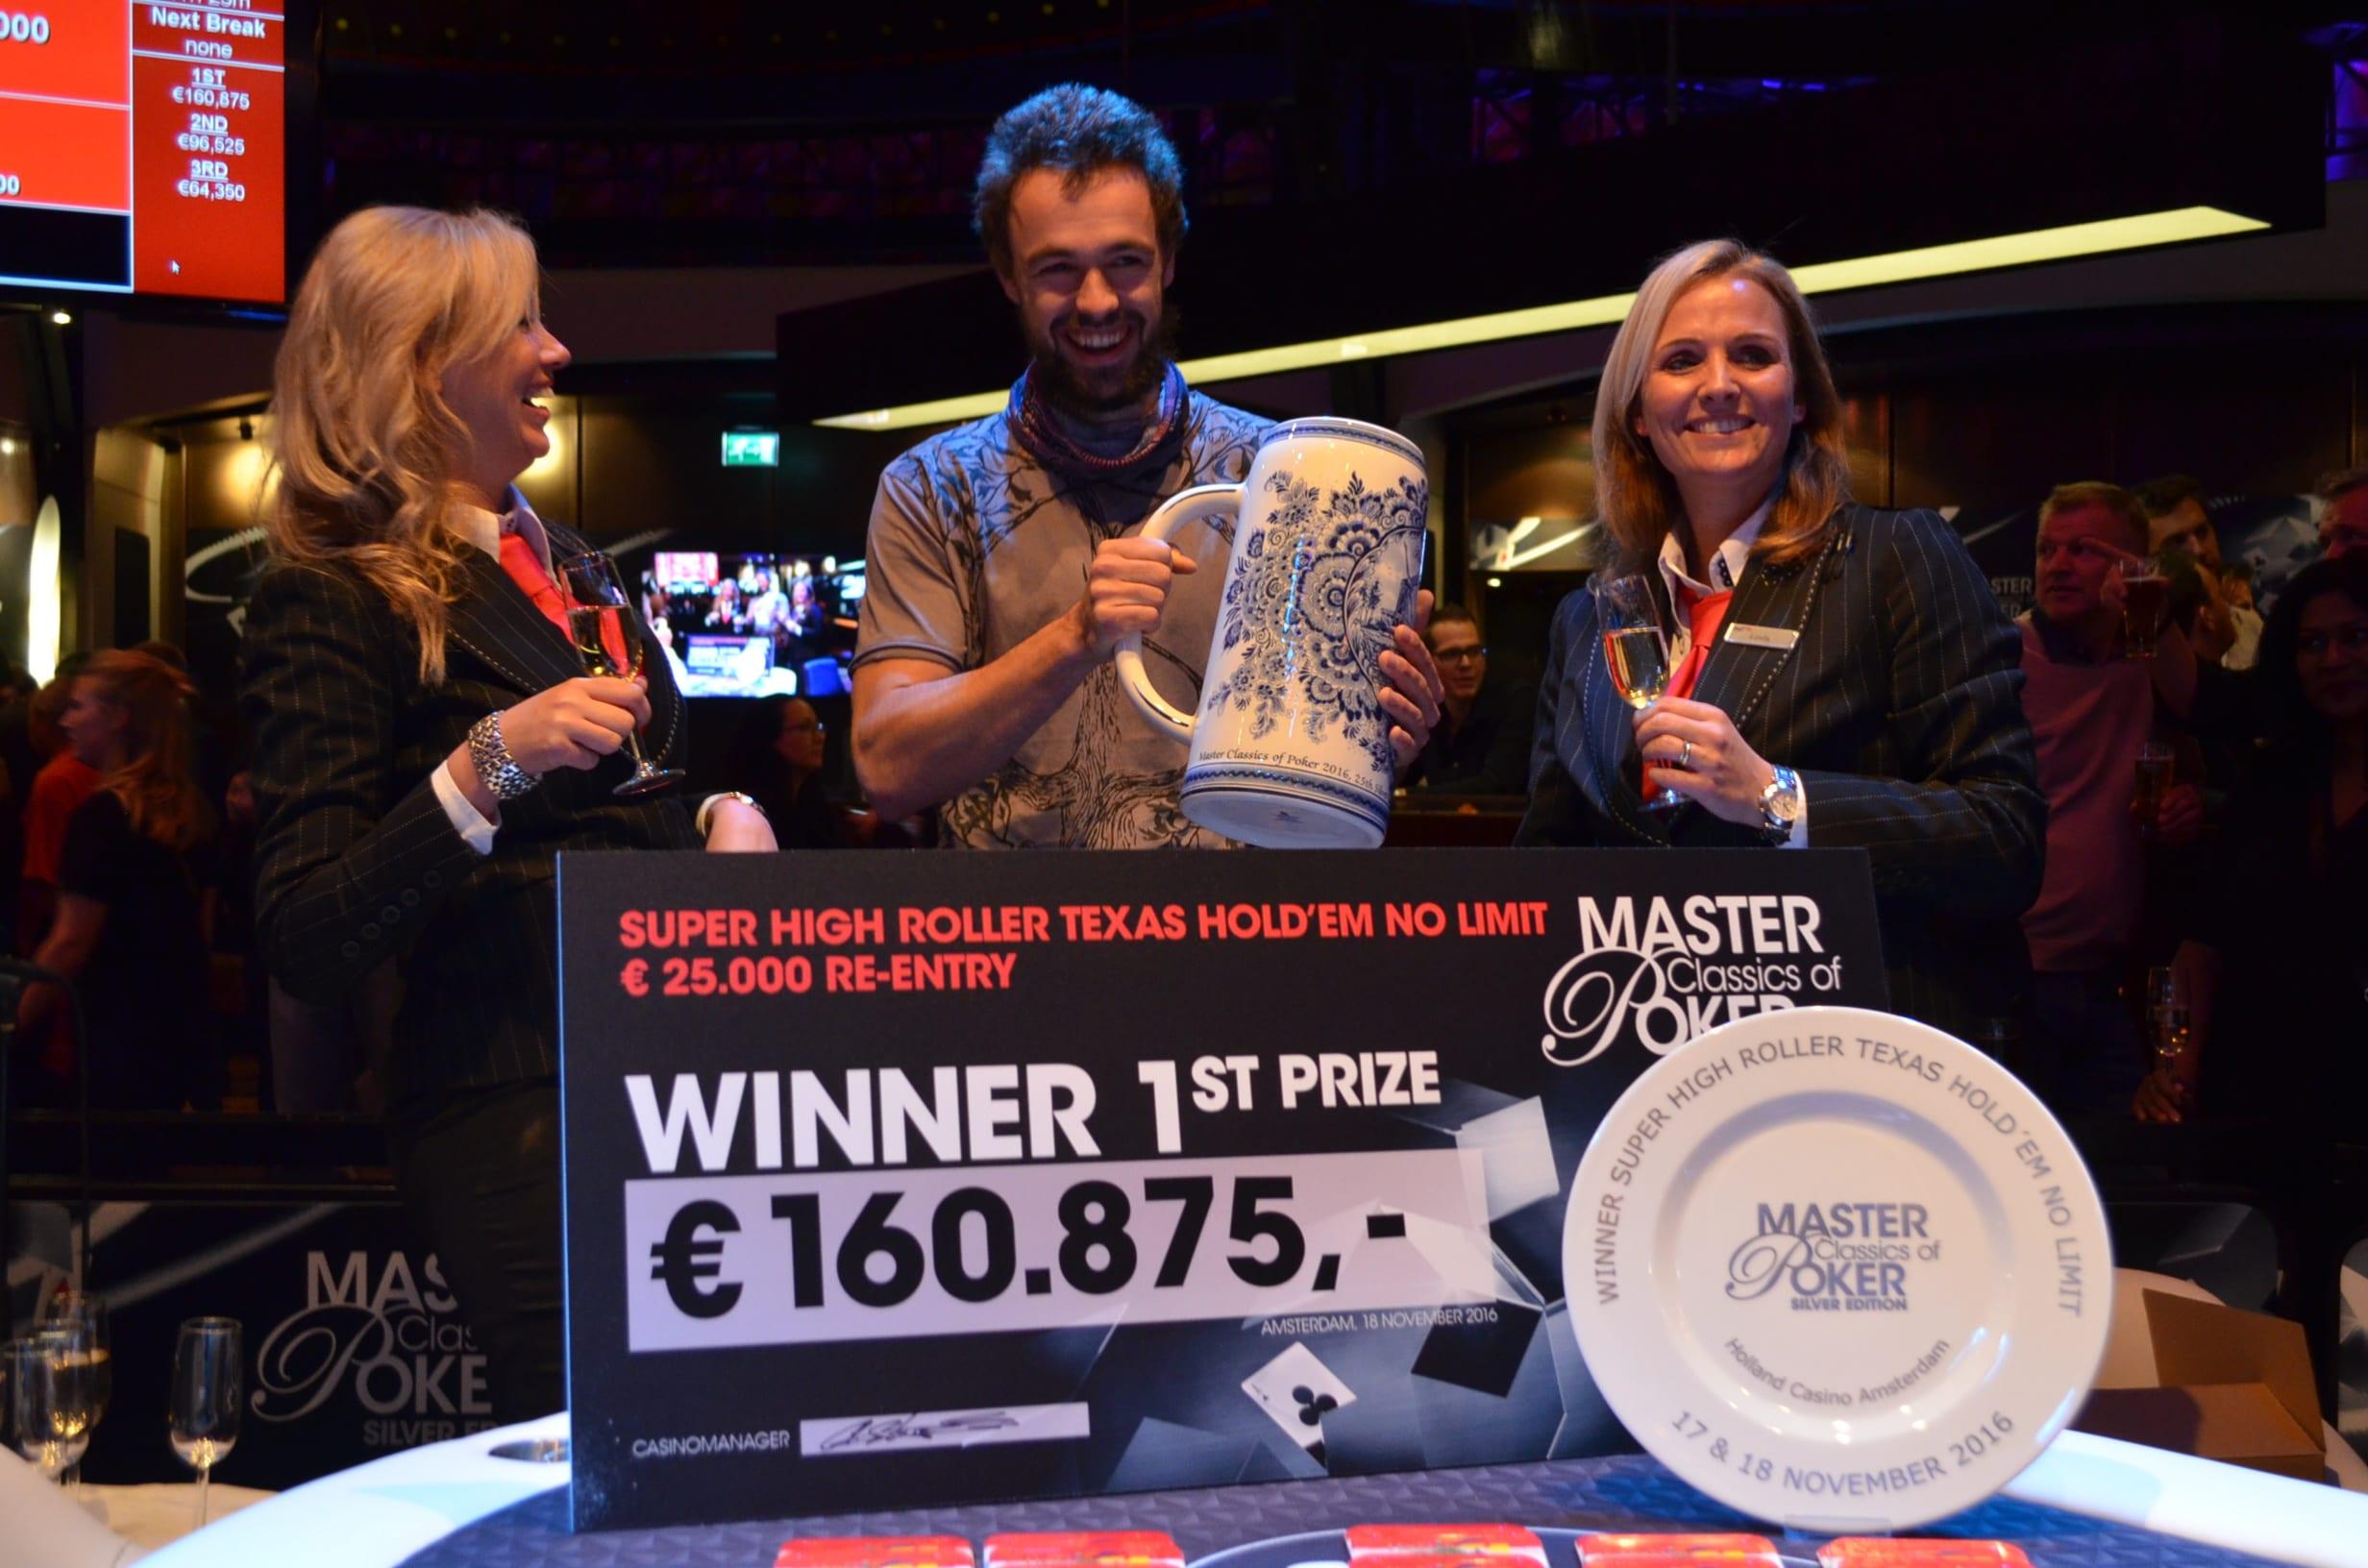 http://www.pokercity.nl/uploads/lrFoto/event1381/DSC_0396.JPG